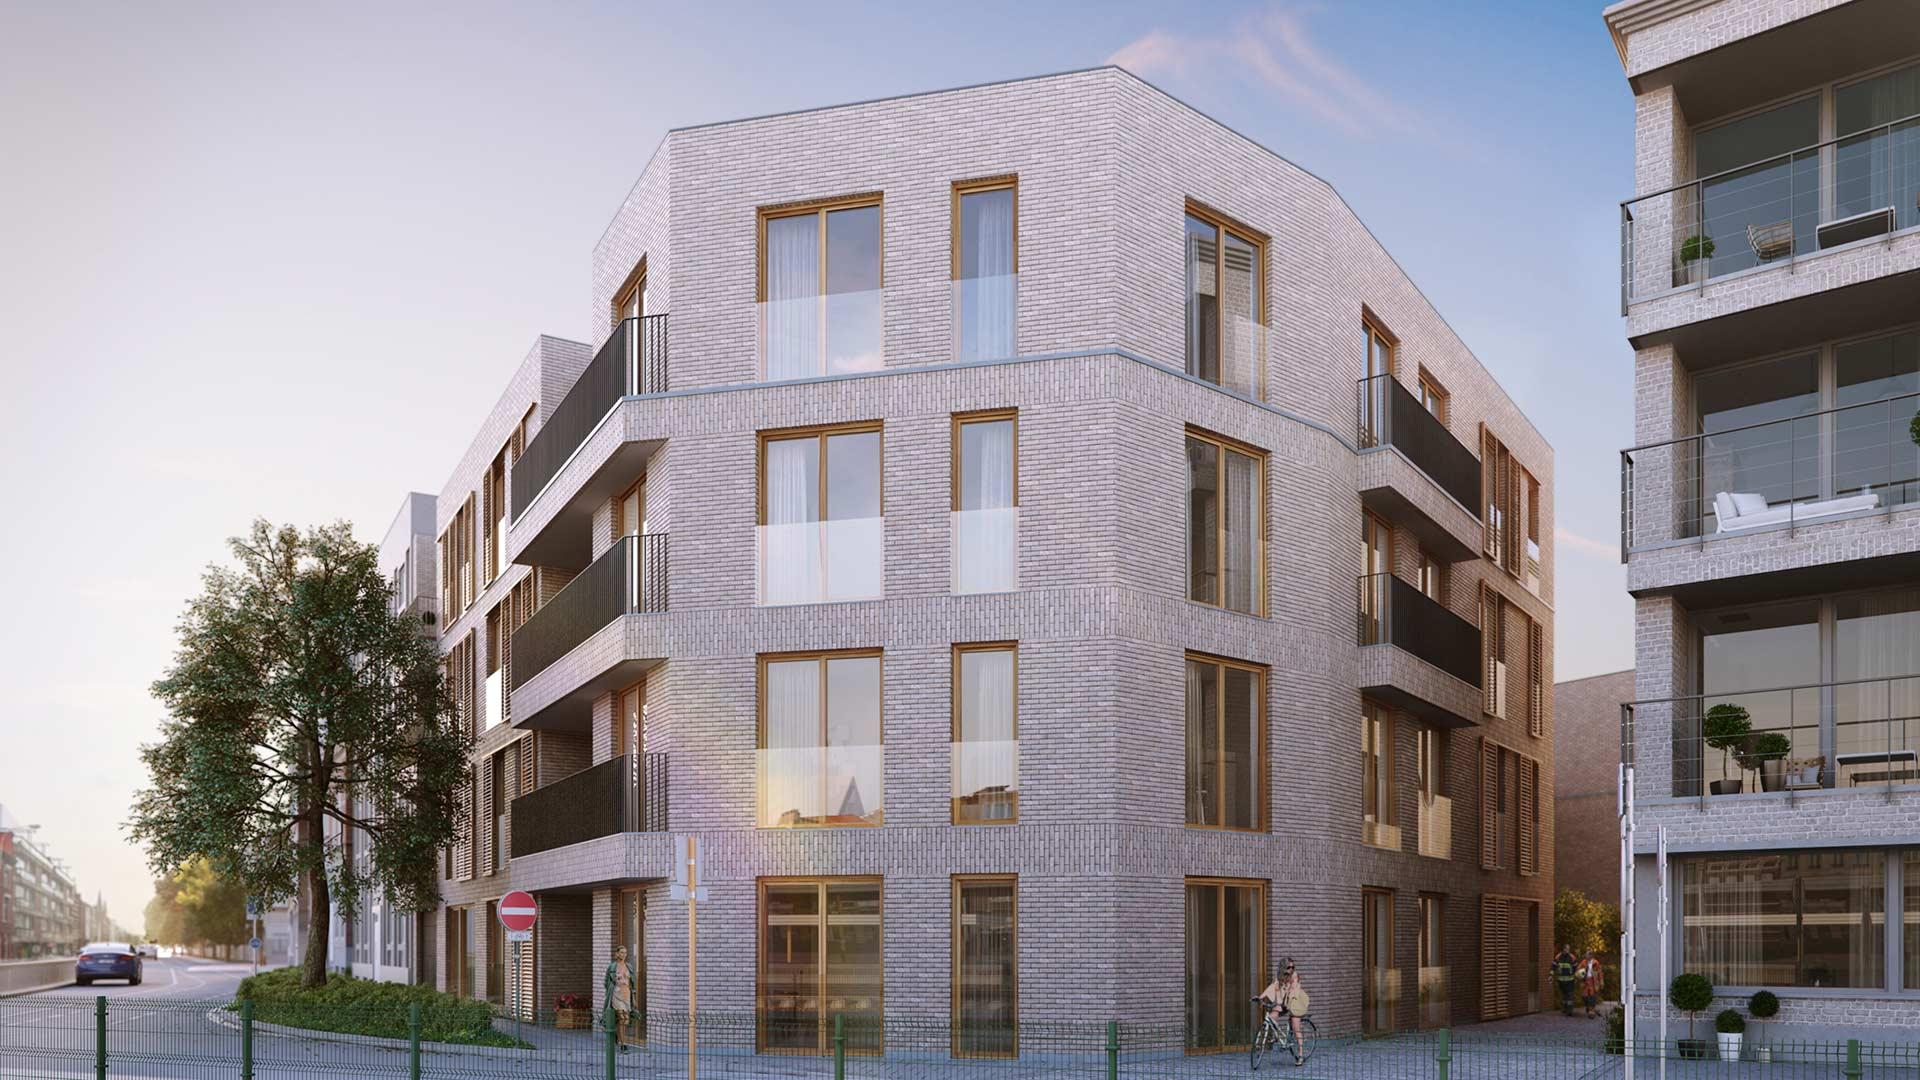 Residentie Allier - Nieuwbouw appartementen - Exterieur